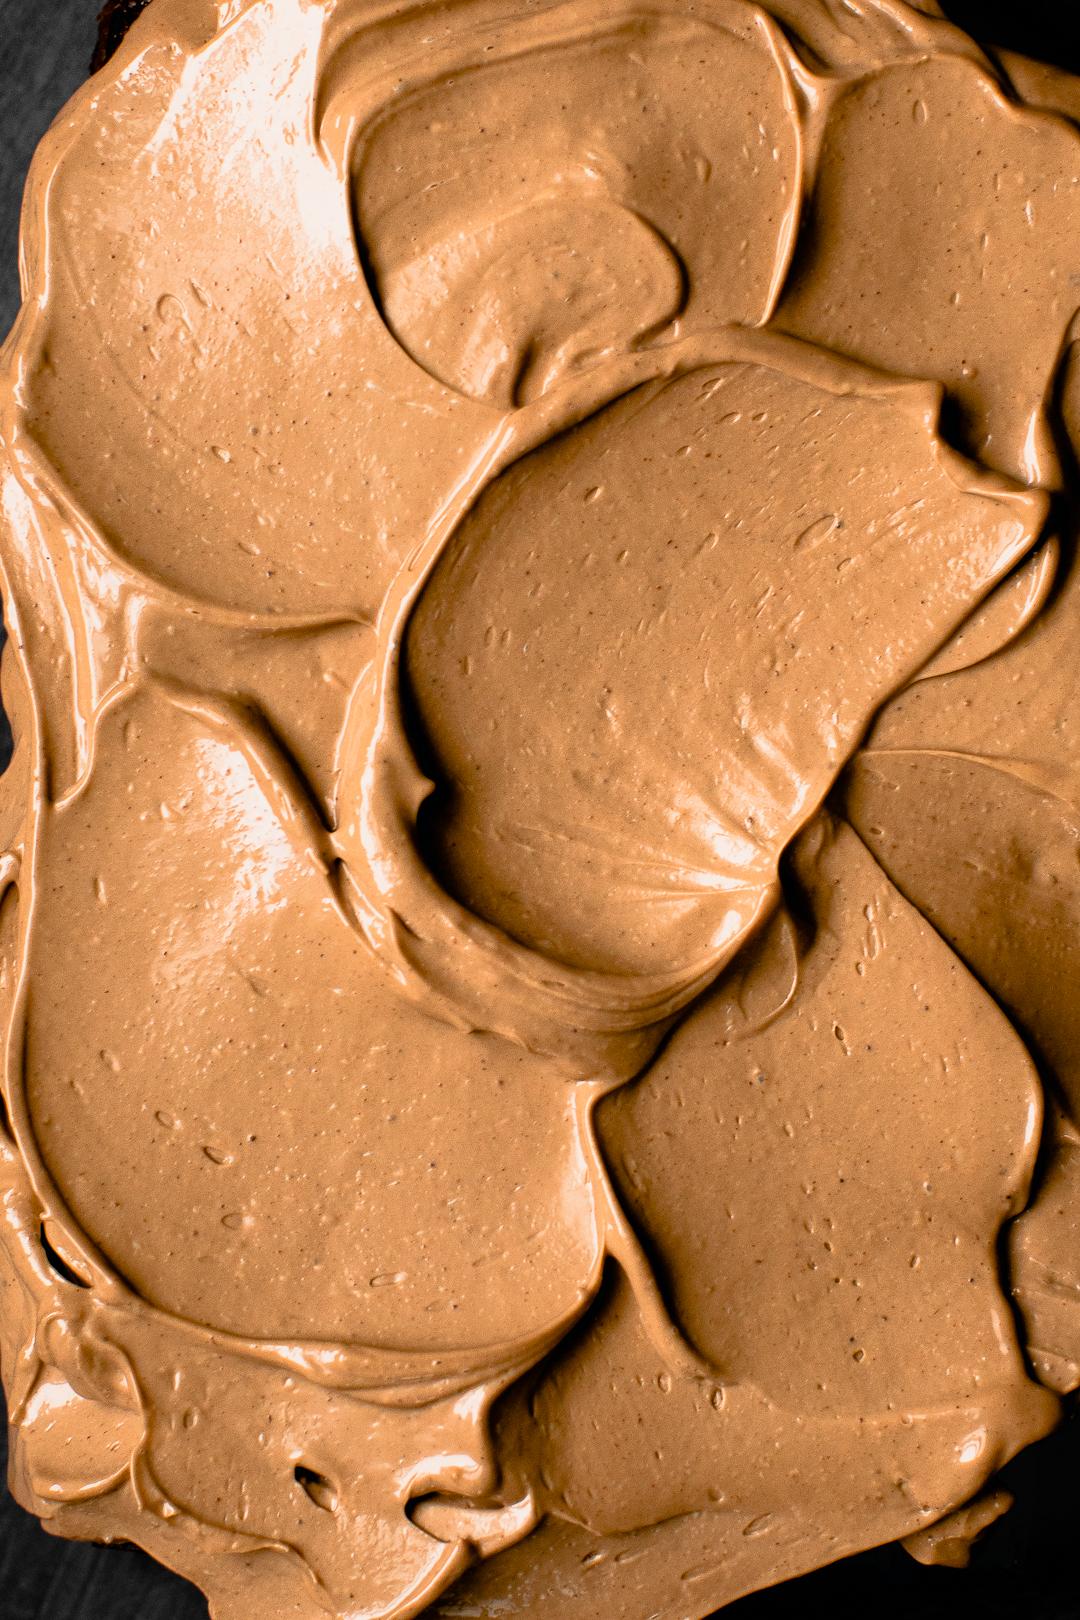 Double_Espresso_Brownie_by_Jordan_Pie_Nutritionist_Photographer-1.jpg